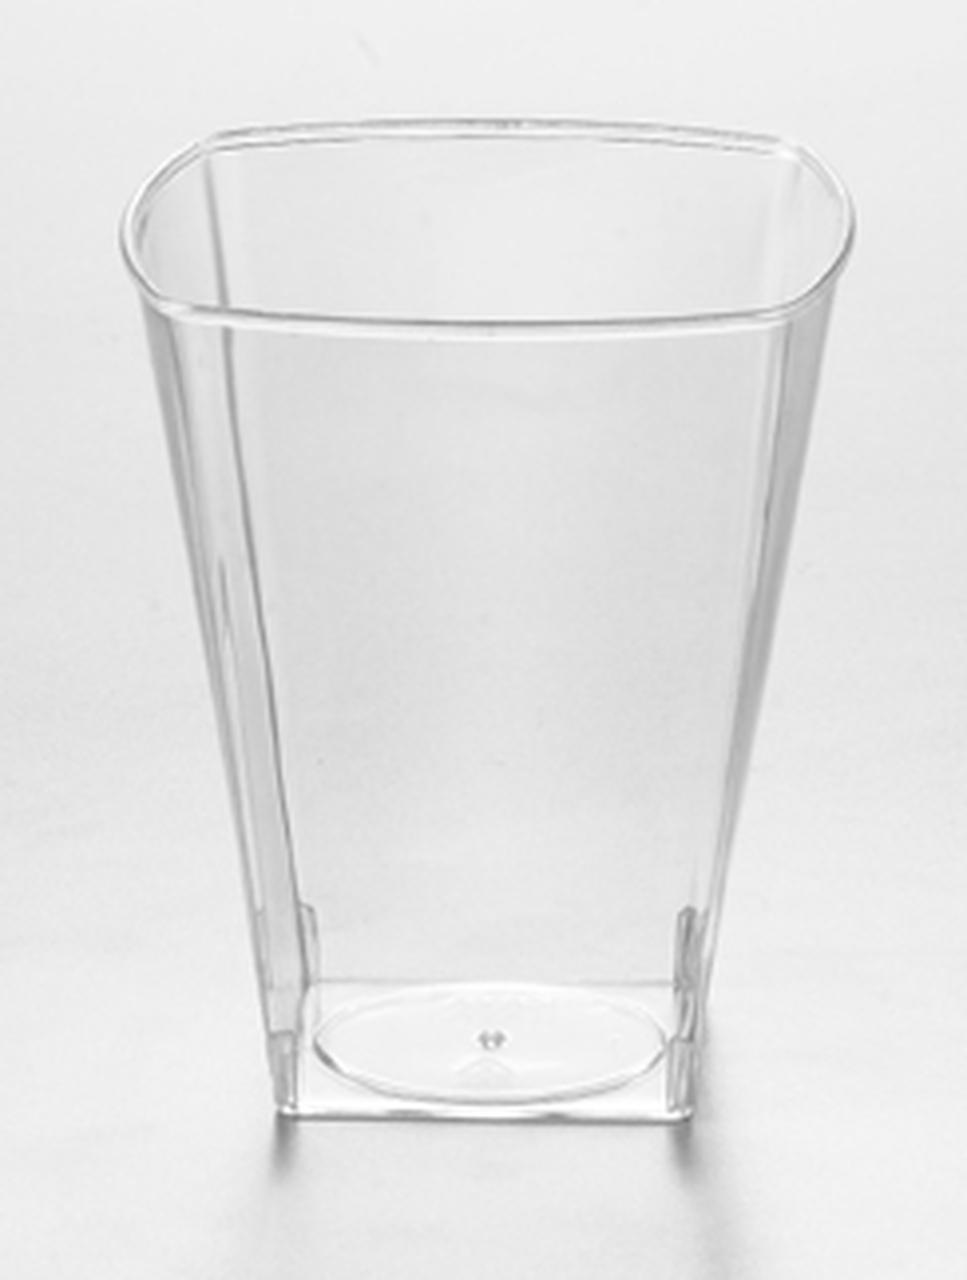 graphic transparent download  oz clear square. Transparent cup tumbler.